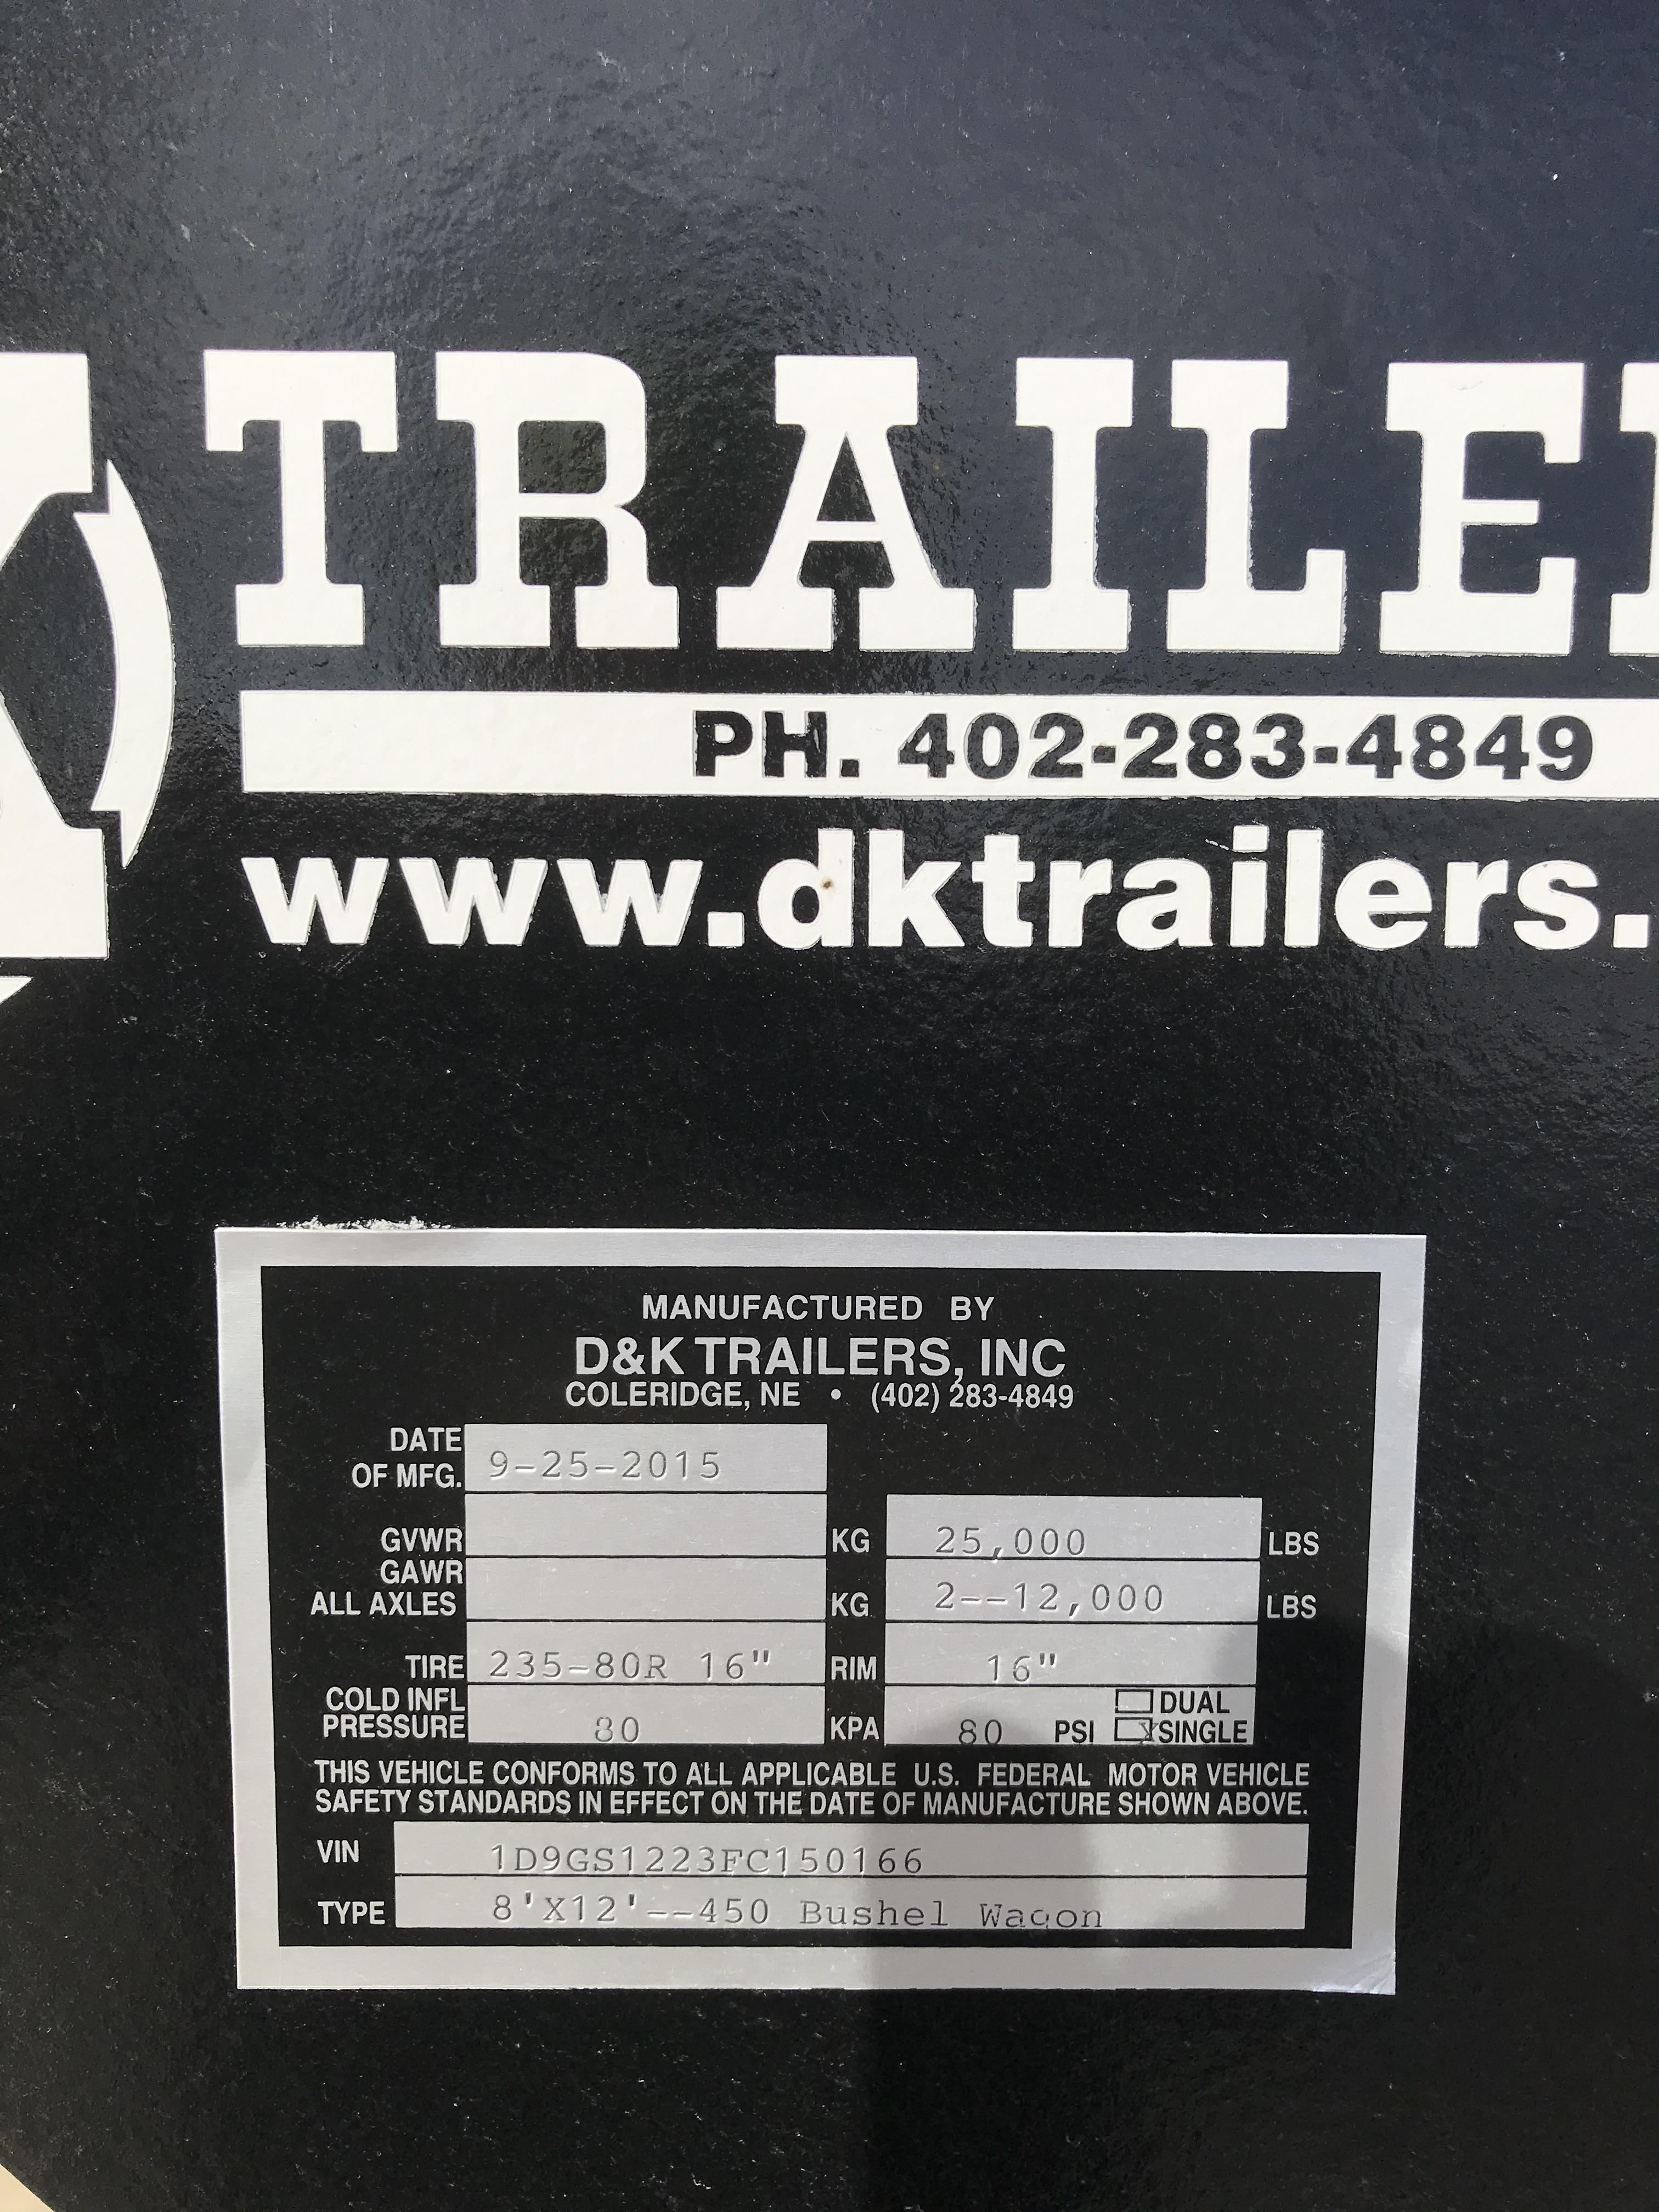 Lot 30 - 2015 D&K Grain Master 450 Bu. Grain Trailer, Gooseneck Hitch, 2-12 Ton Axles, Twin Jacks, Elec. Over